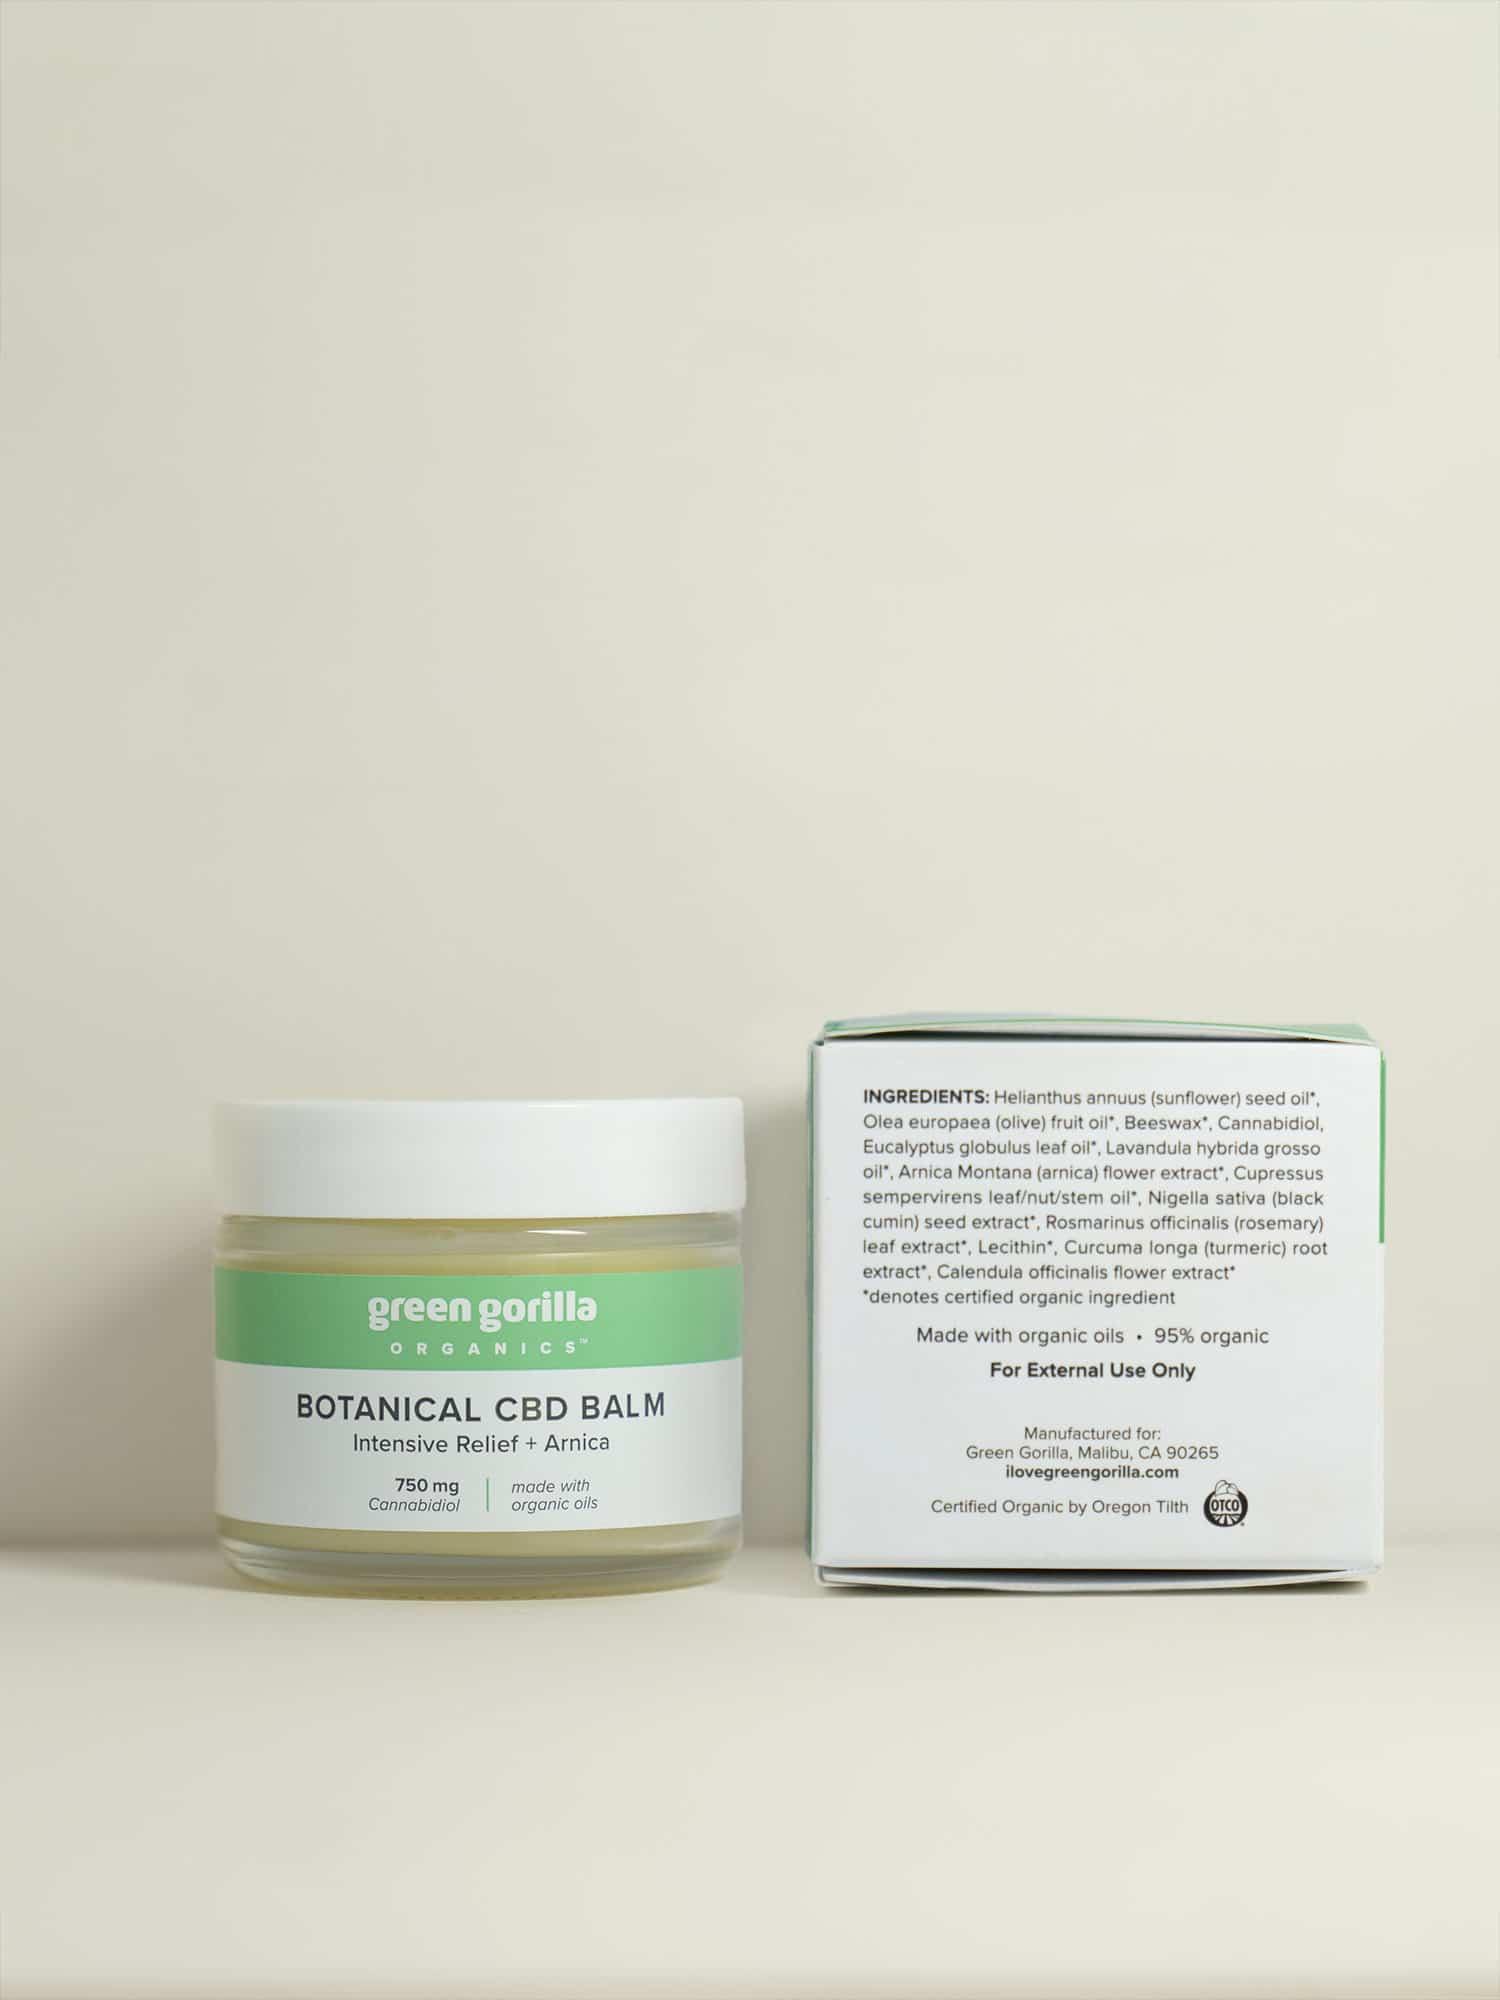 Intensive Relief Botanical CBD Balm - 750mg | Green Gorilla